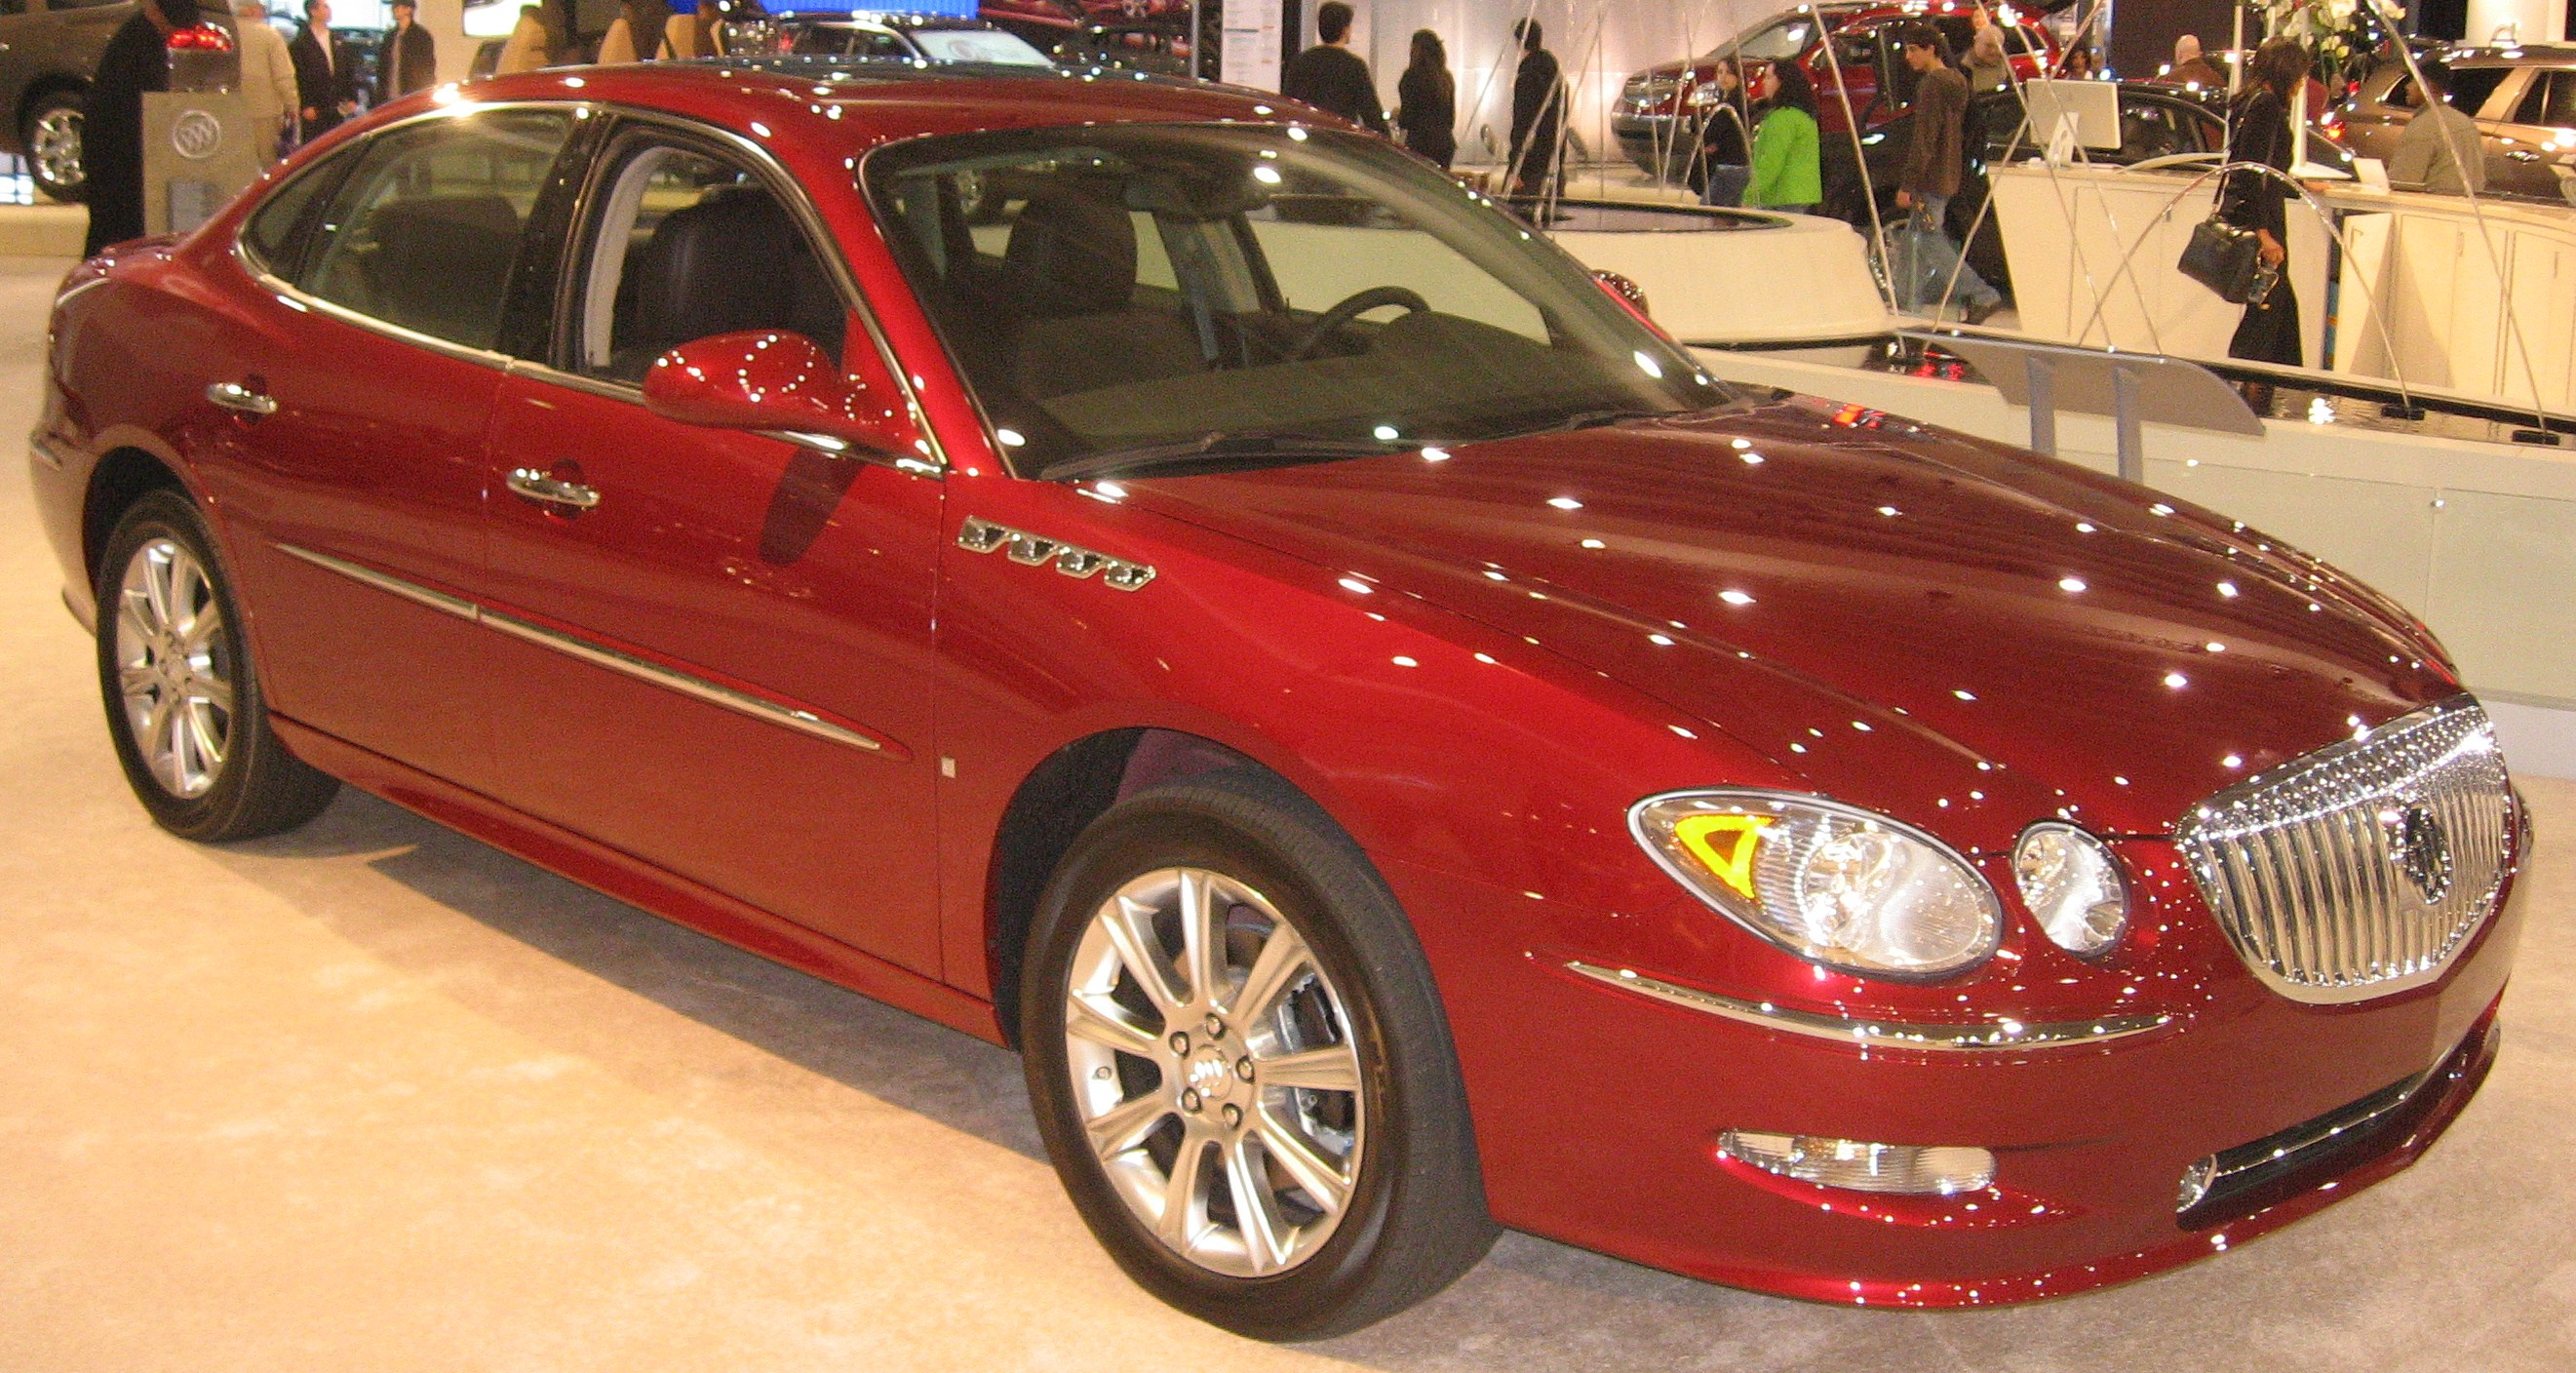 China Only 2016 Chevrolet Malibu Has Aussie Beginnings also E5 88 AB E5 85 8Blacrosse E8 80 81 E6 AC BE E5 9B BE E7 89 87 in addition 4 Buick Lacrosse likewise 1759 2009 Buick Lacrosse 11 moreover 2104 2008 Buick Lacrosse 8. on buick lacrosse